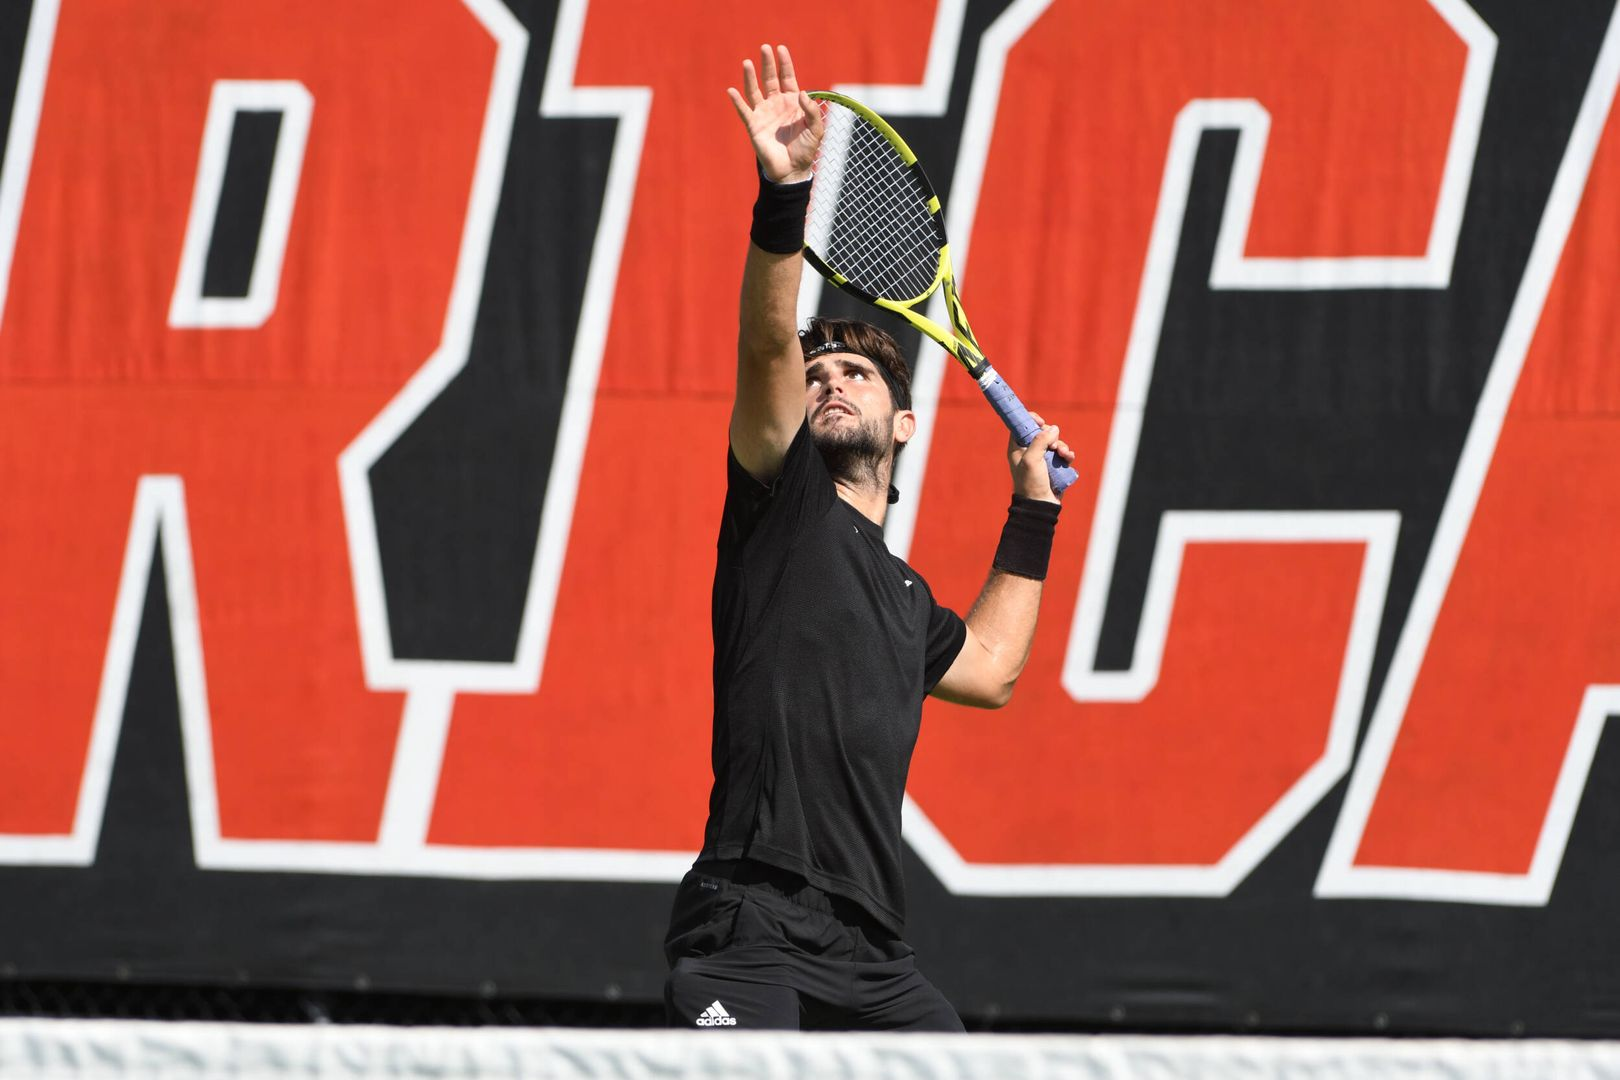 Miami Opens Fall Season at Auburn Invitational